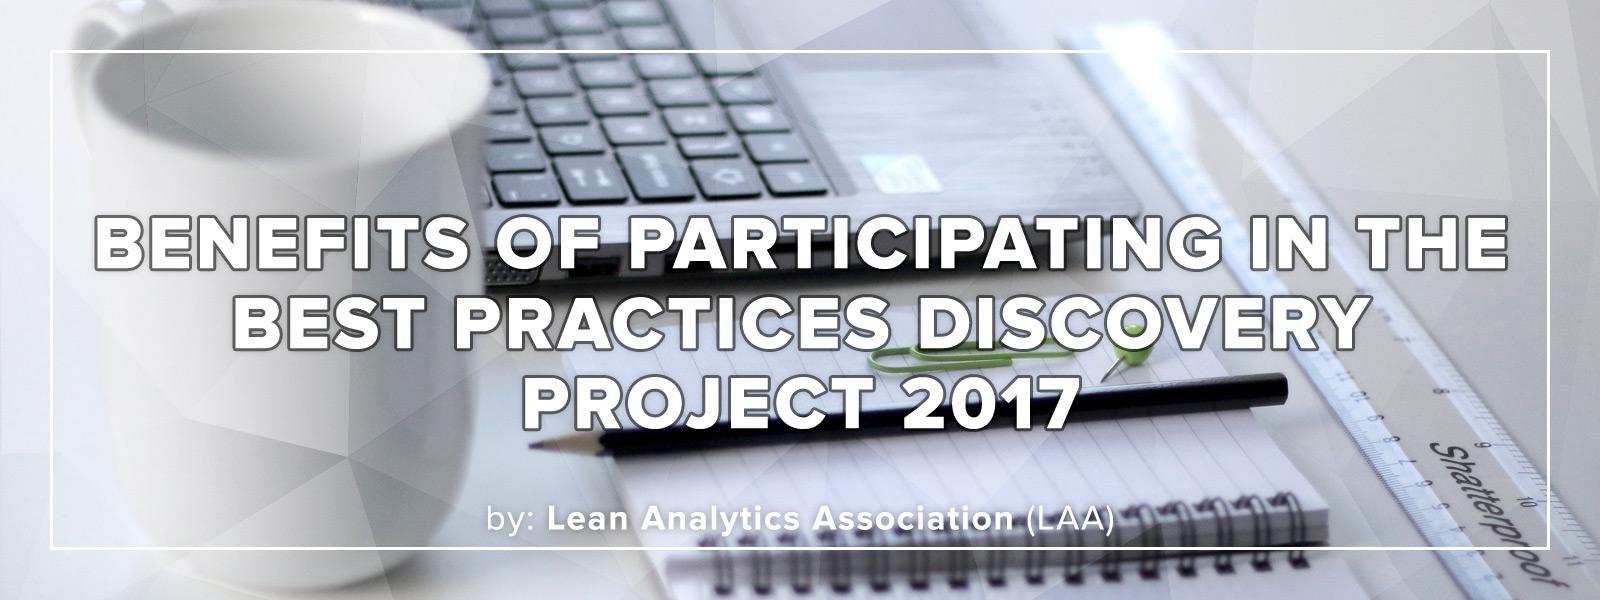 LAA-Blog---Benefits-of-BPDP17